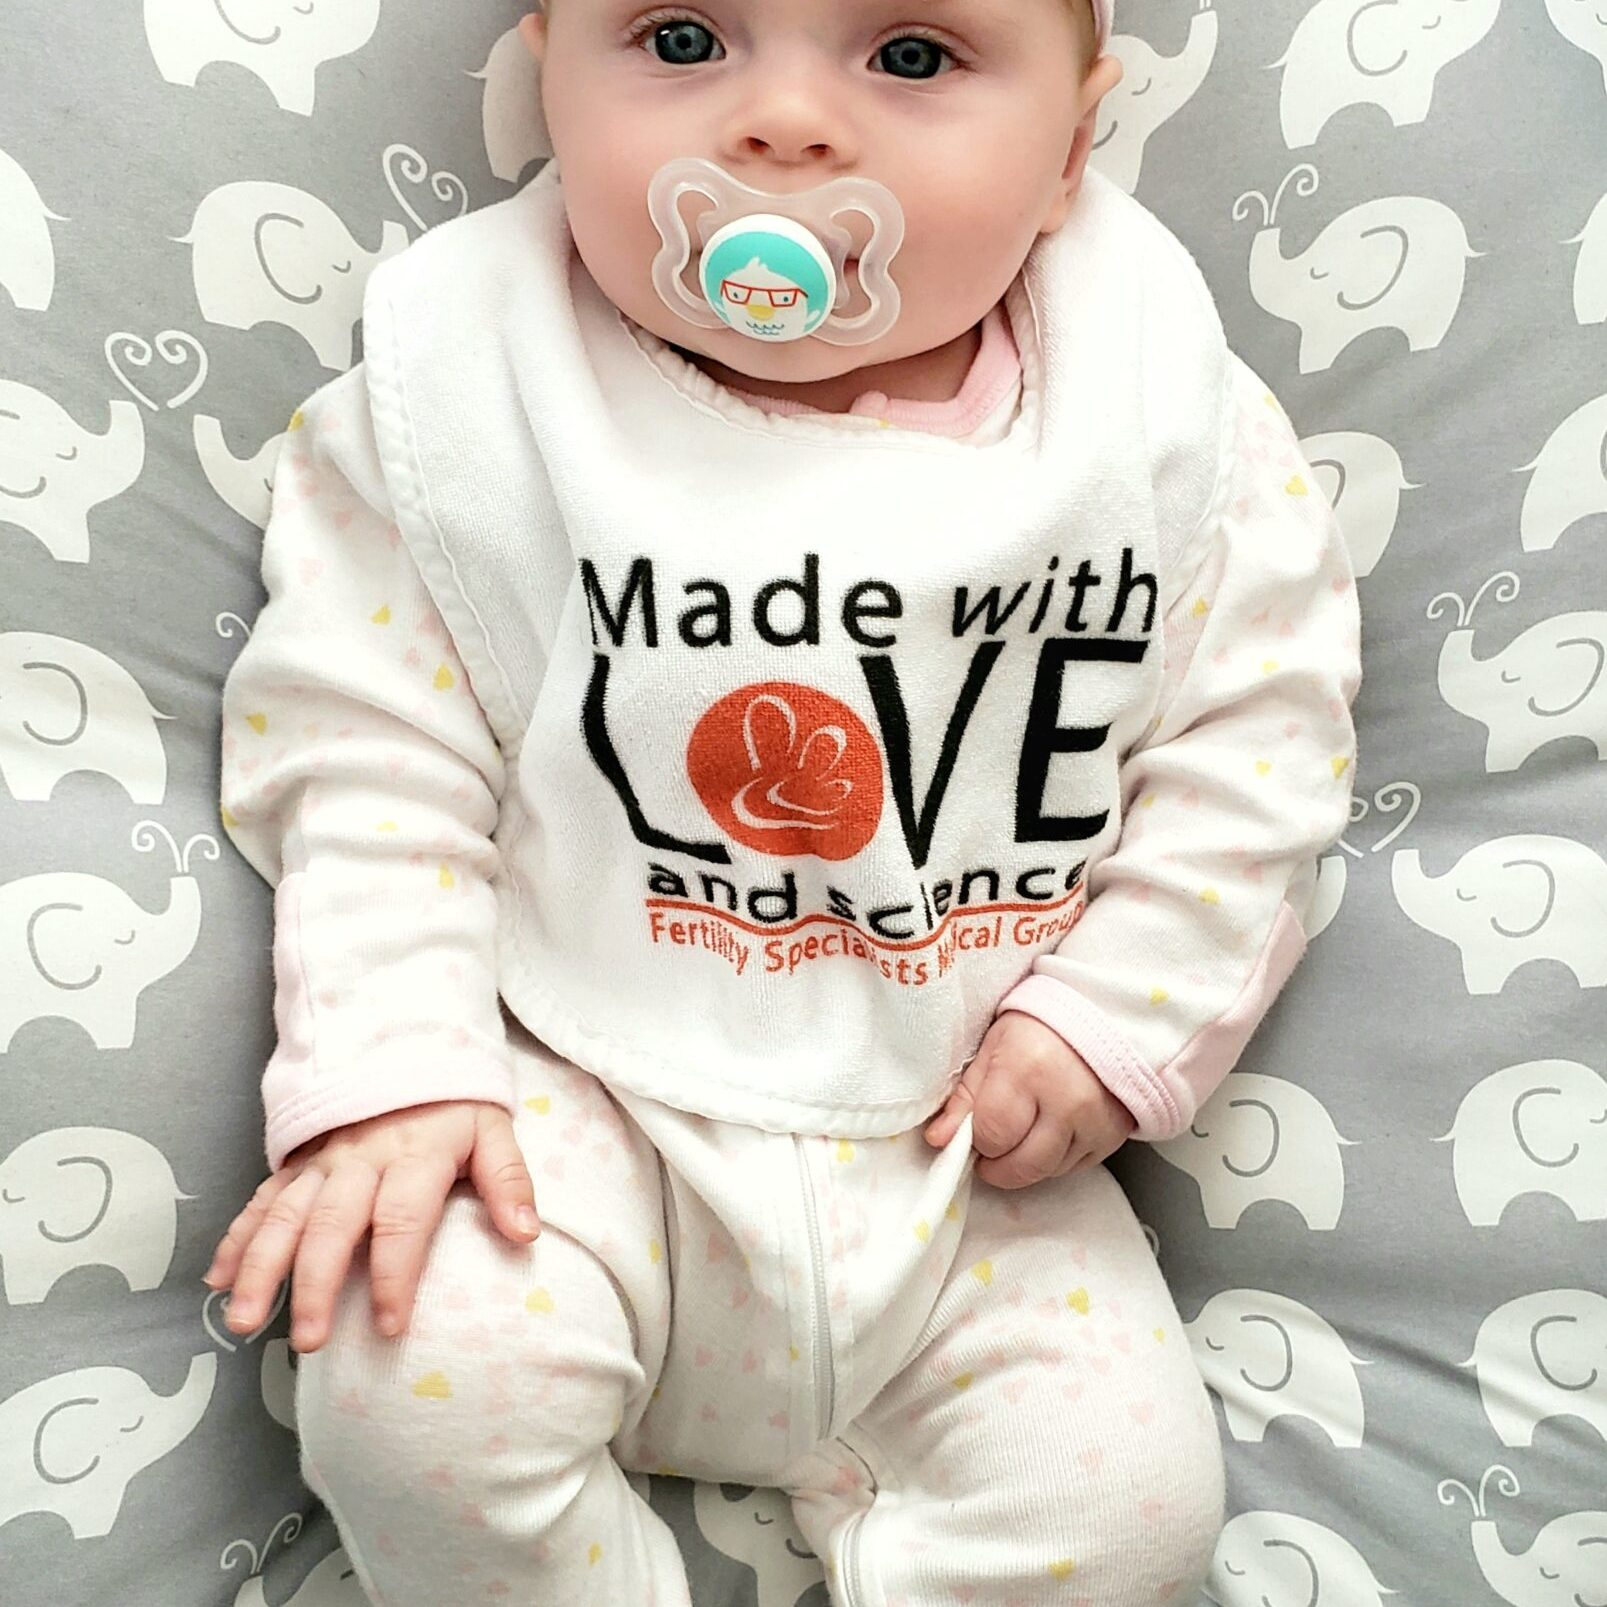 Baby Remmie